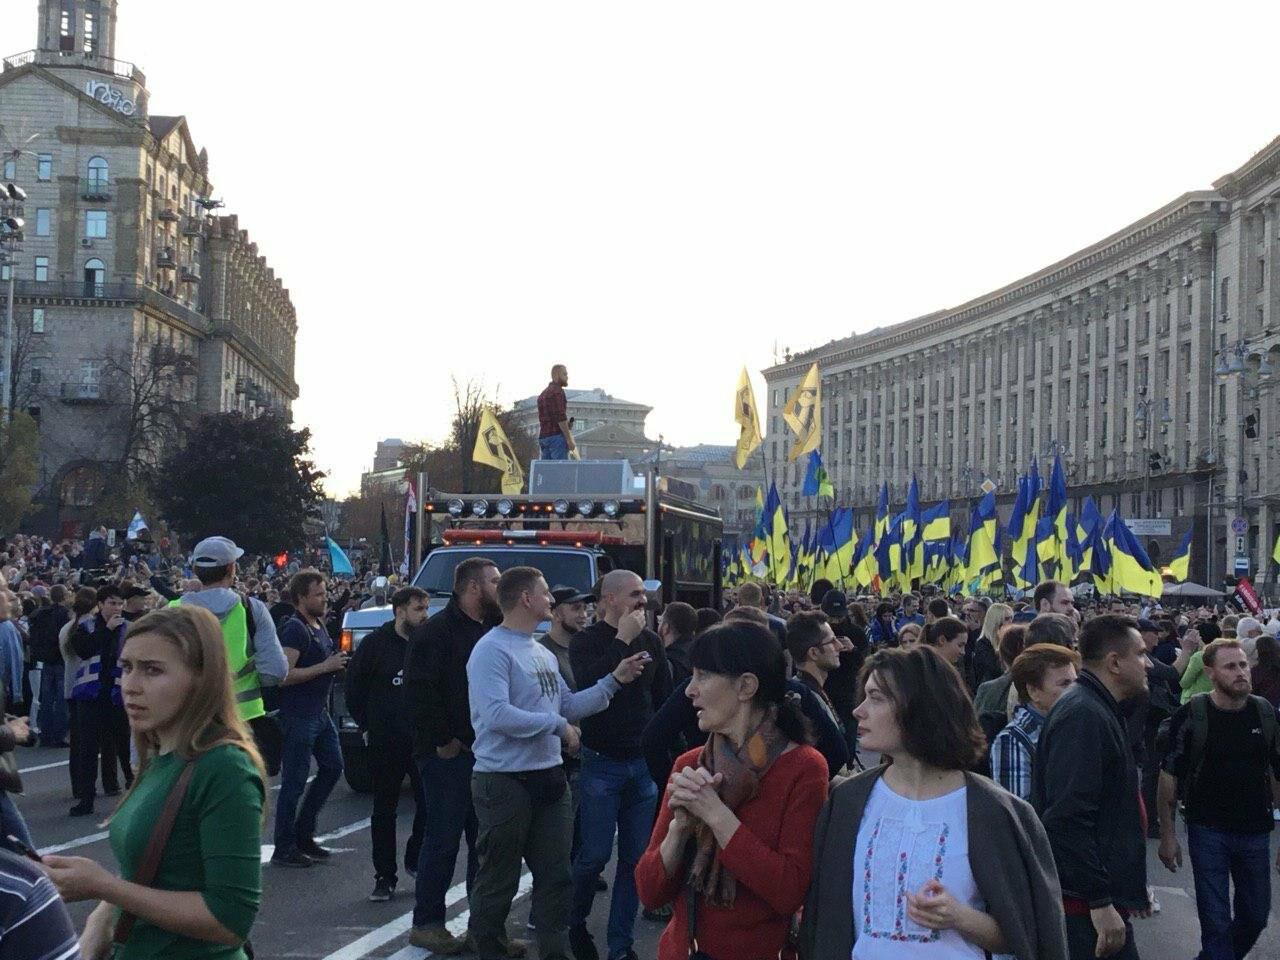 Криворожане поддержали Марш сопротивления капитуляции в Киеве, - ФОТО, ВИДЕО, ОБНОВЛЕНО, фото-31